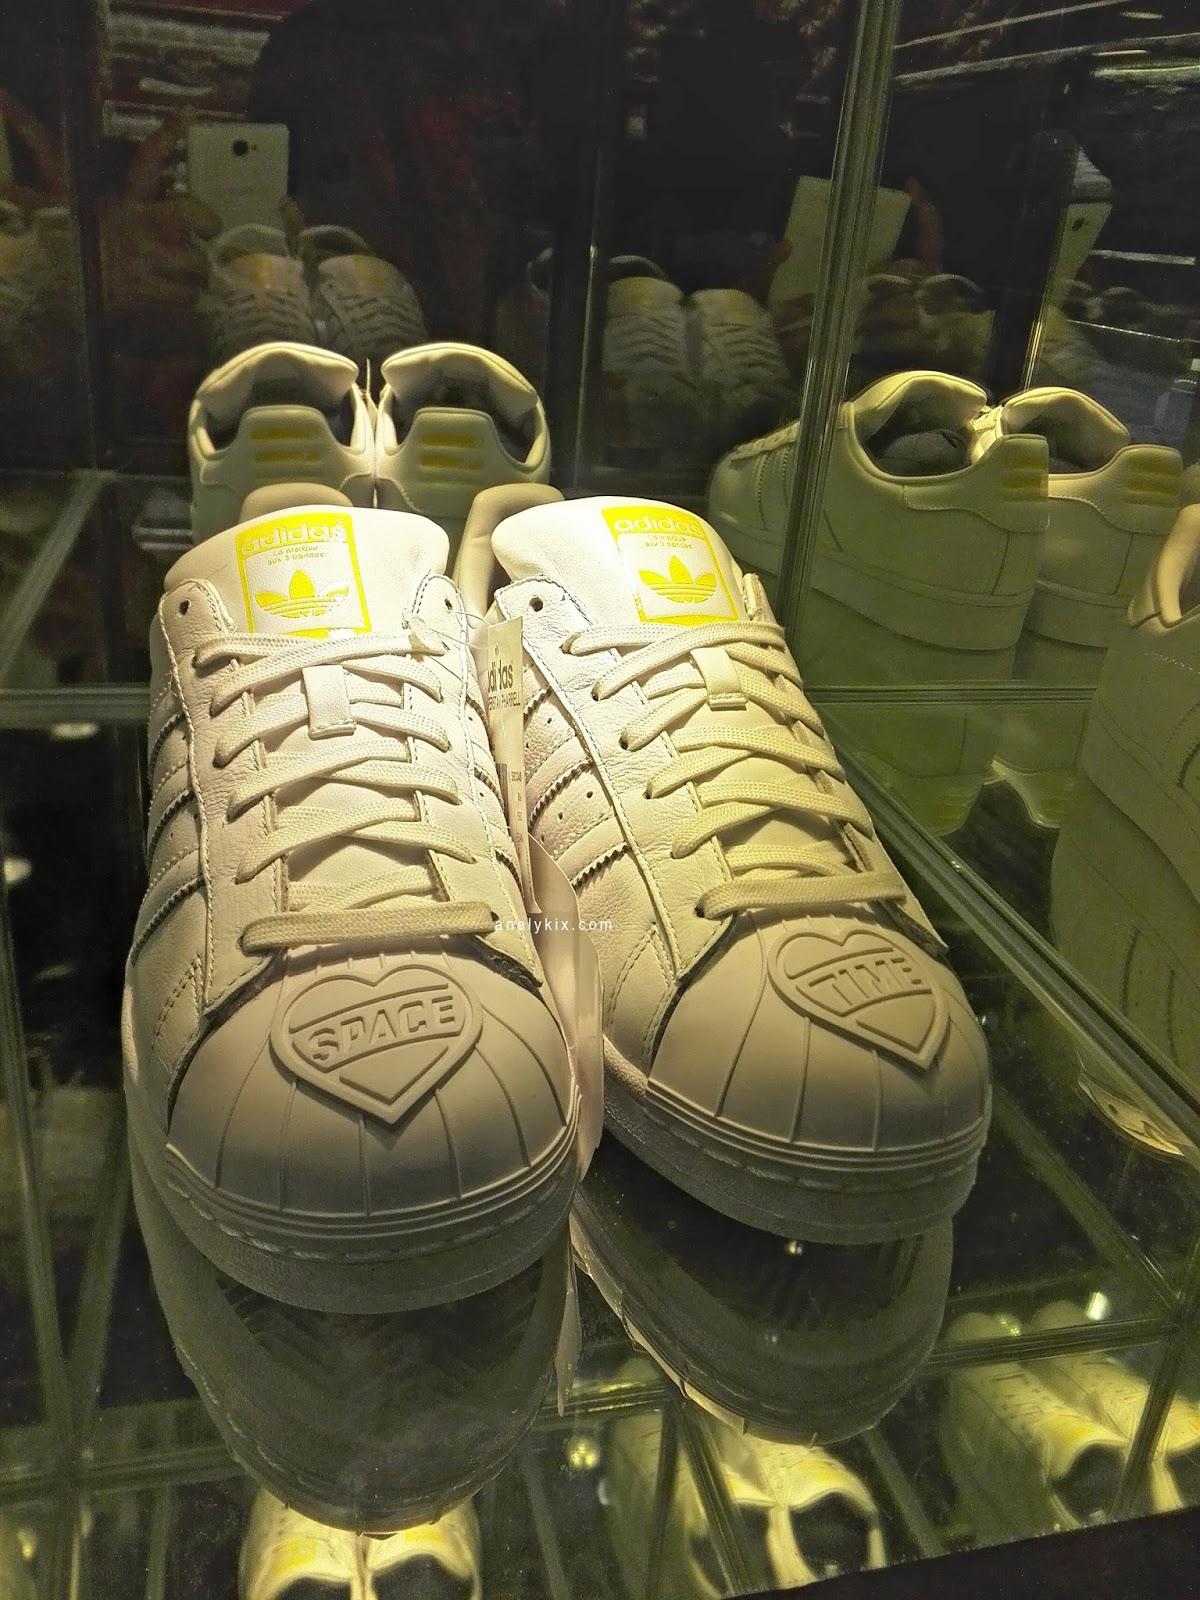 a6b7b5a350b08f Adidas Supershell Sole Academy (Trinoma) Exclusives